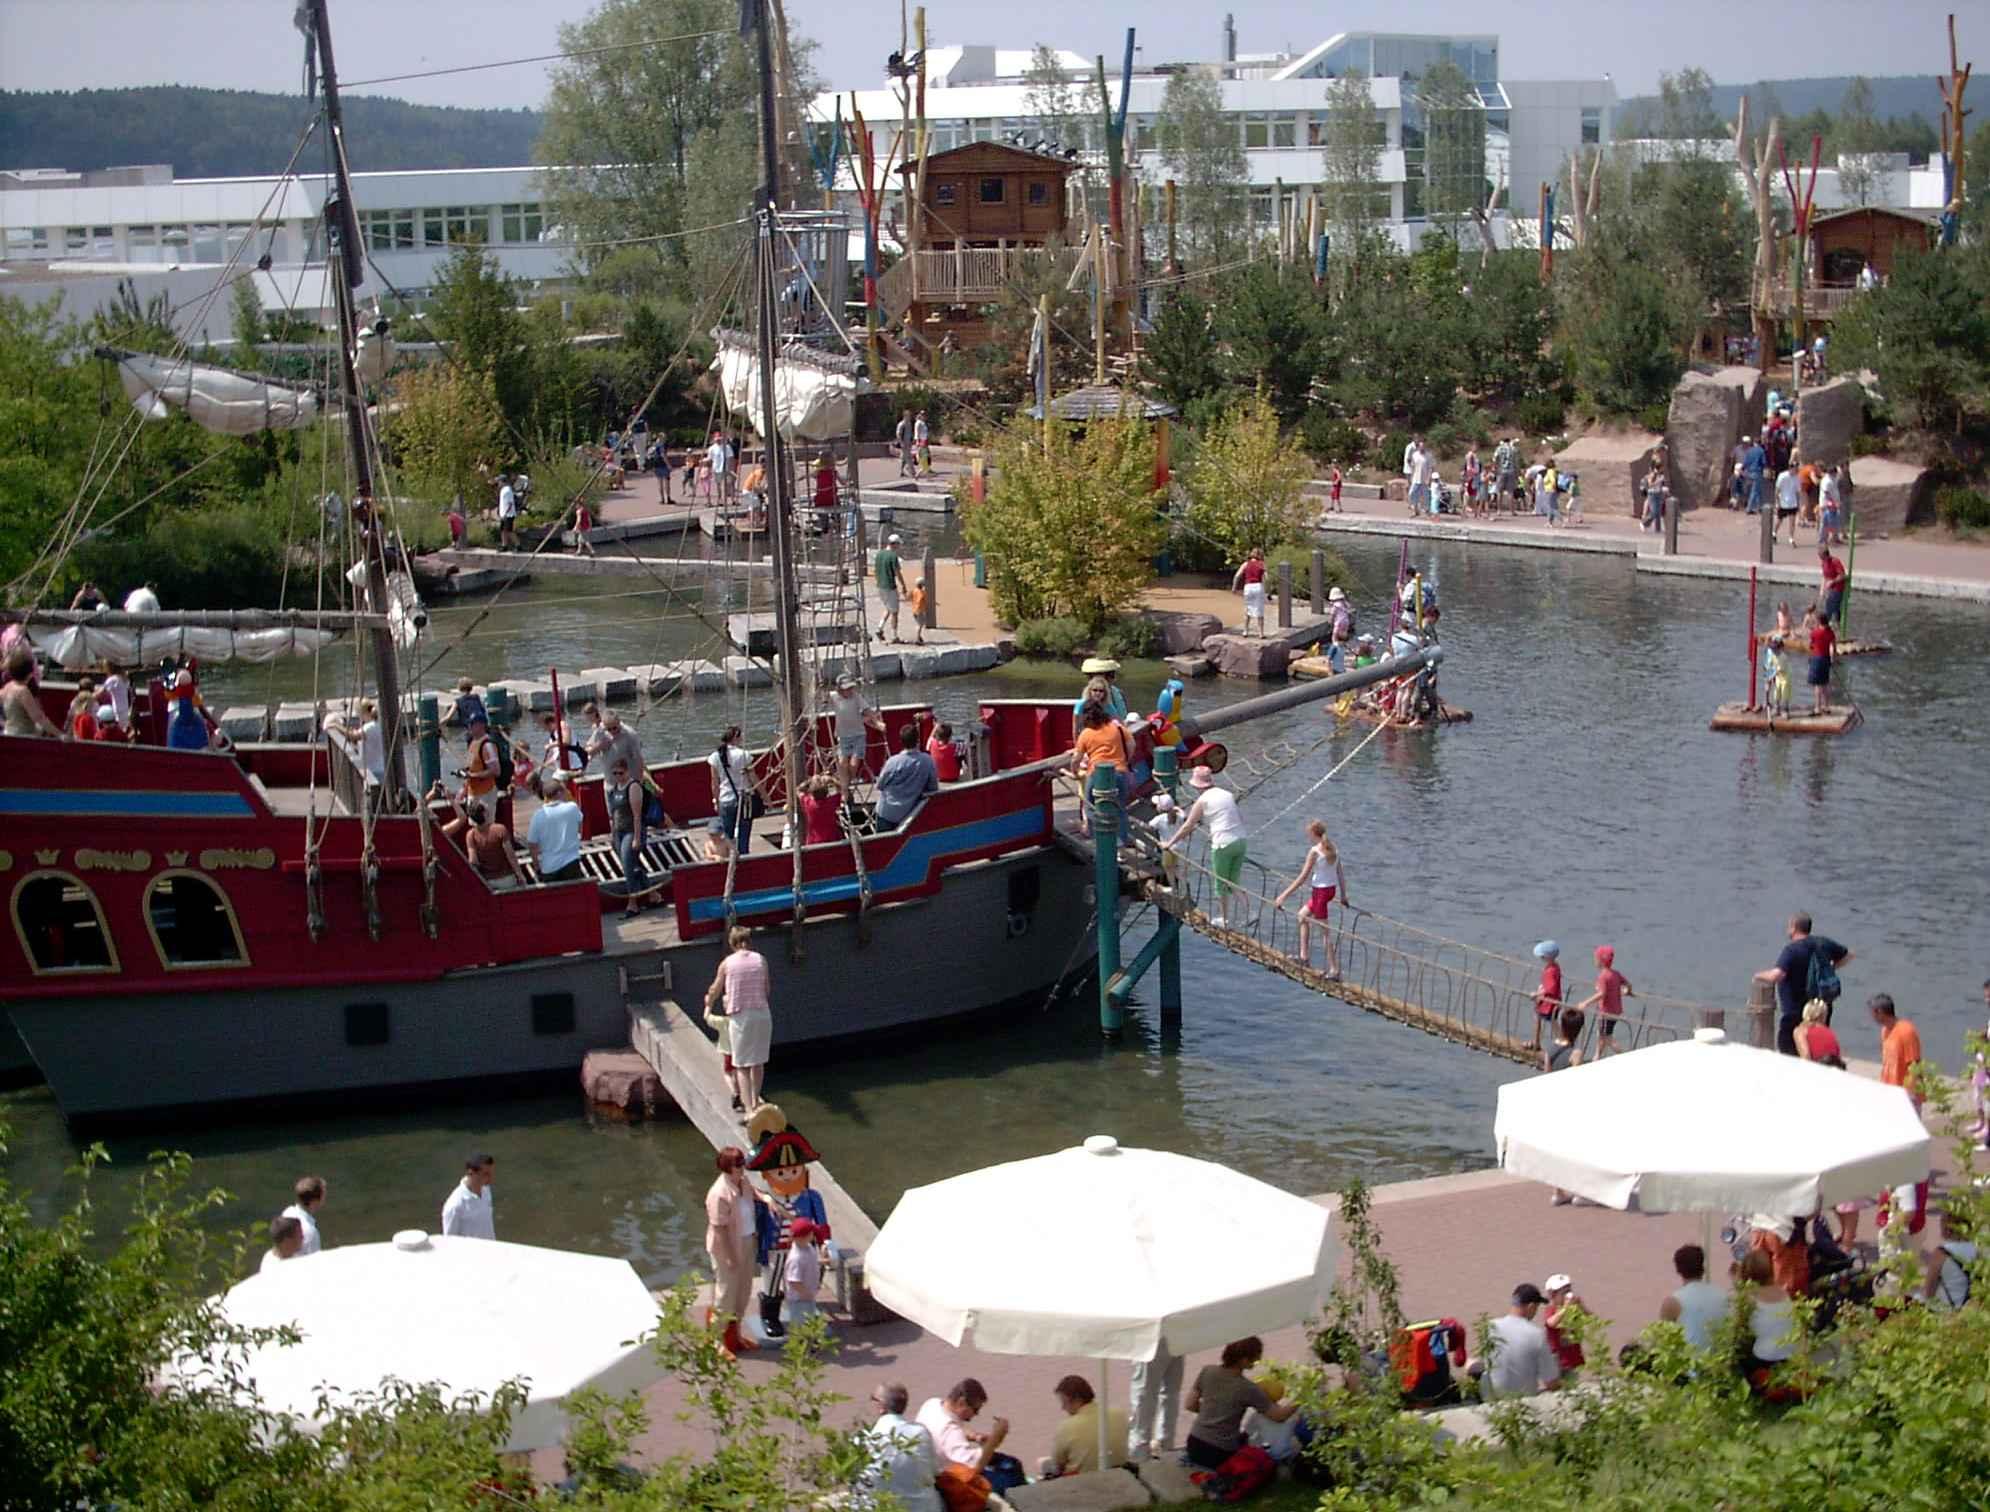 Deutschland Playmobil Funpark Further Hotel Mercure Nurnberg West